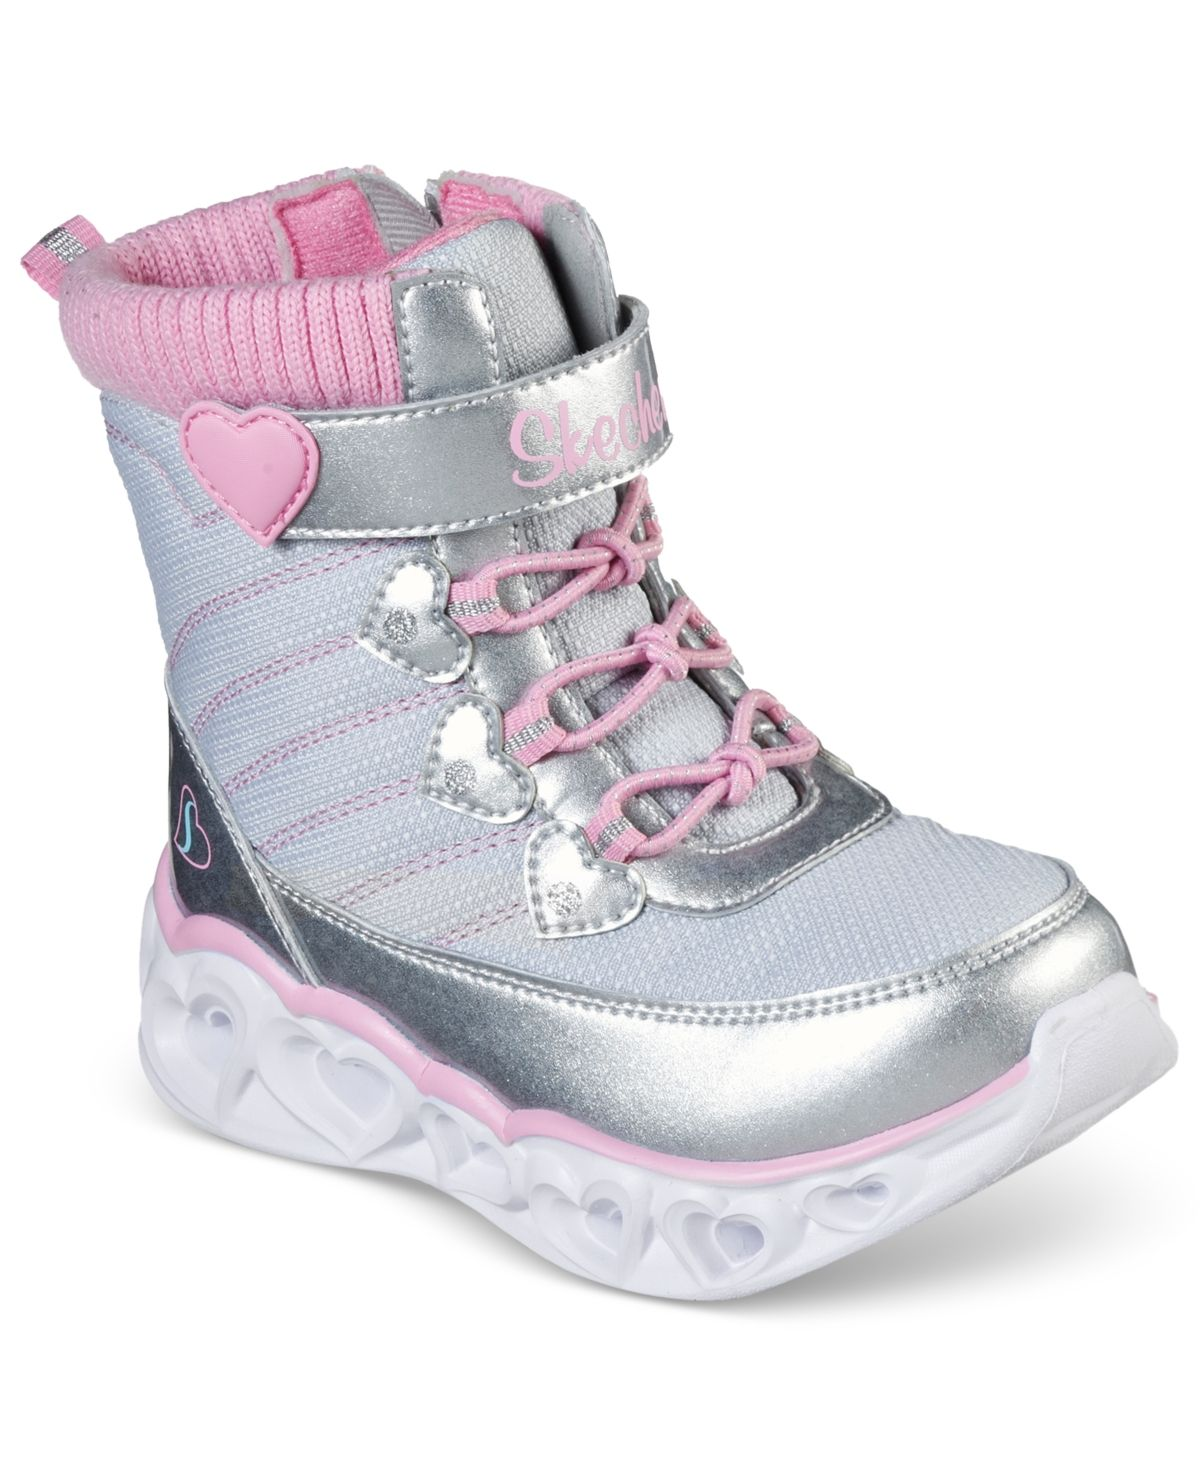 Skechers Toddler Girls Twinkle Toes